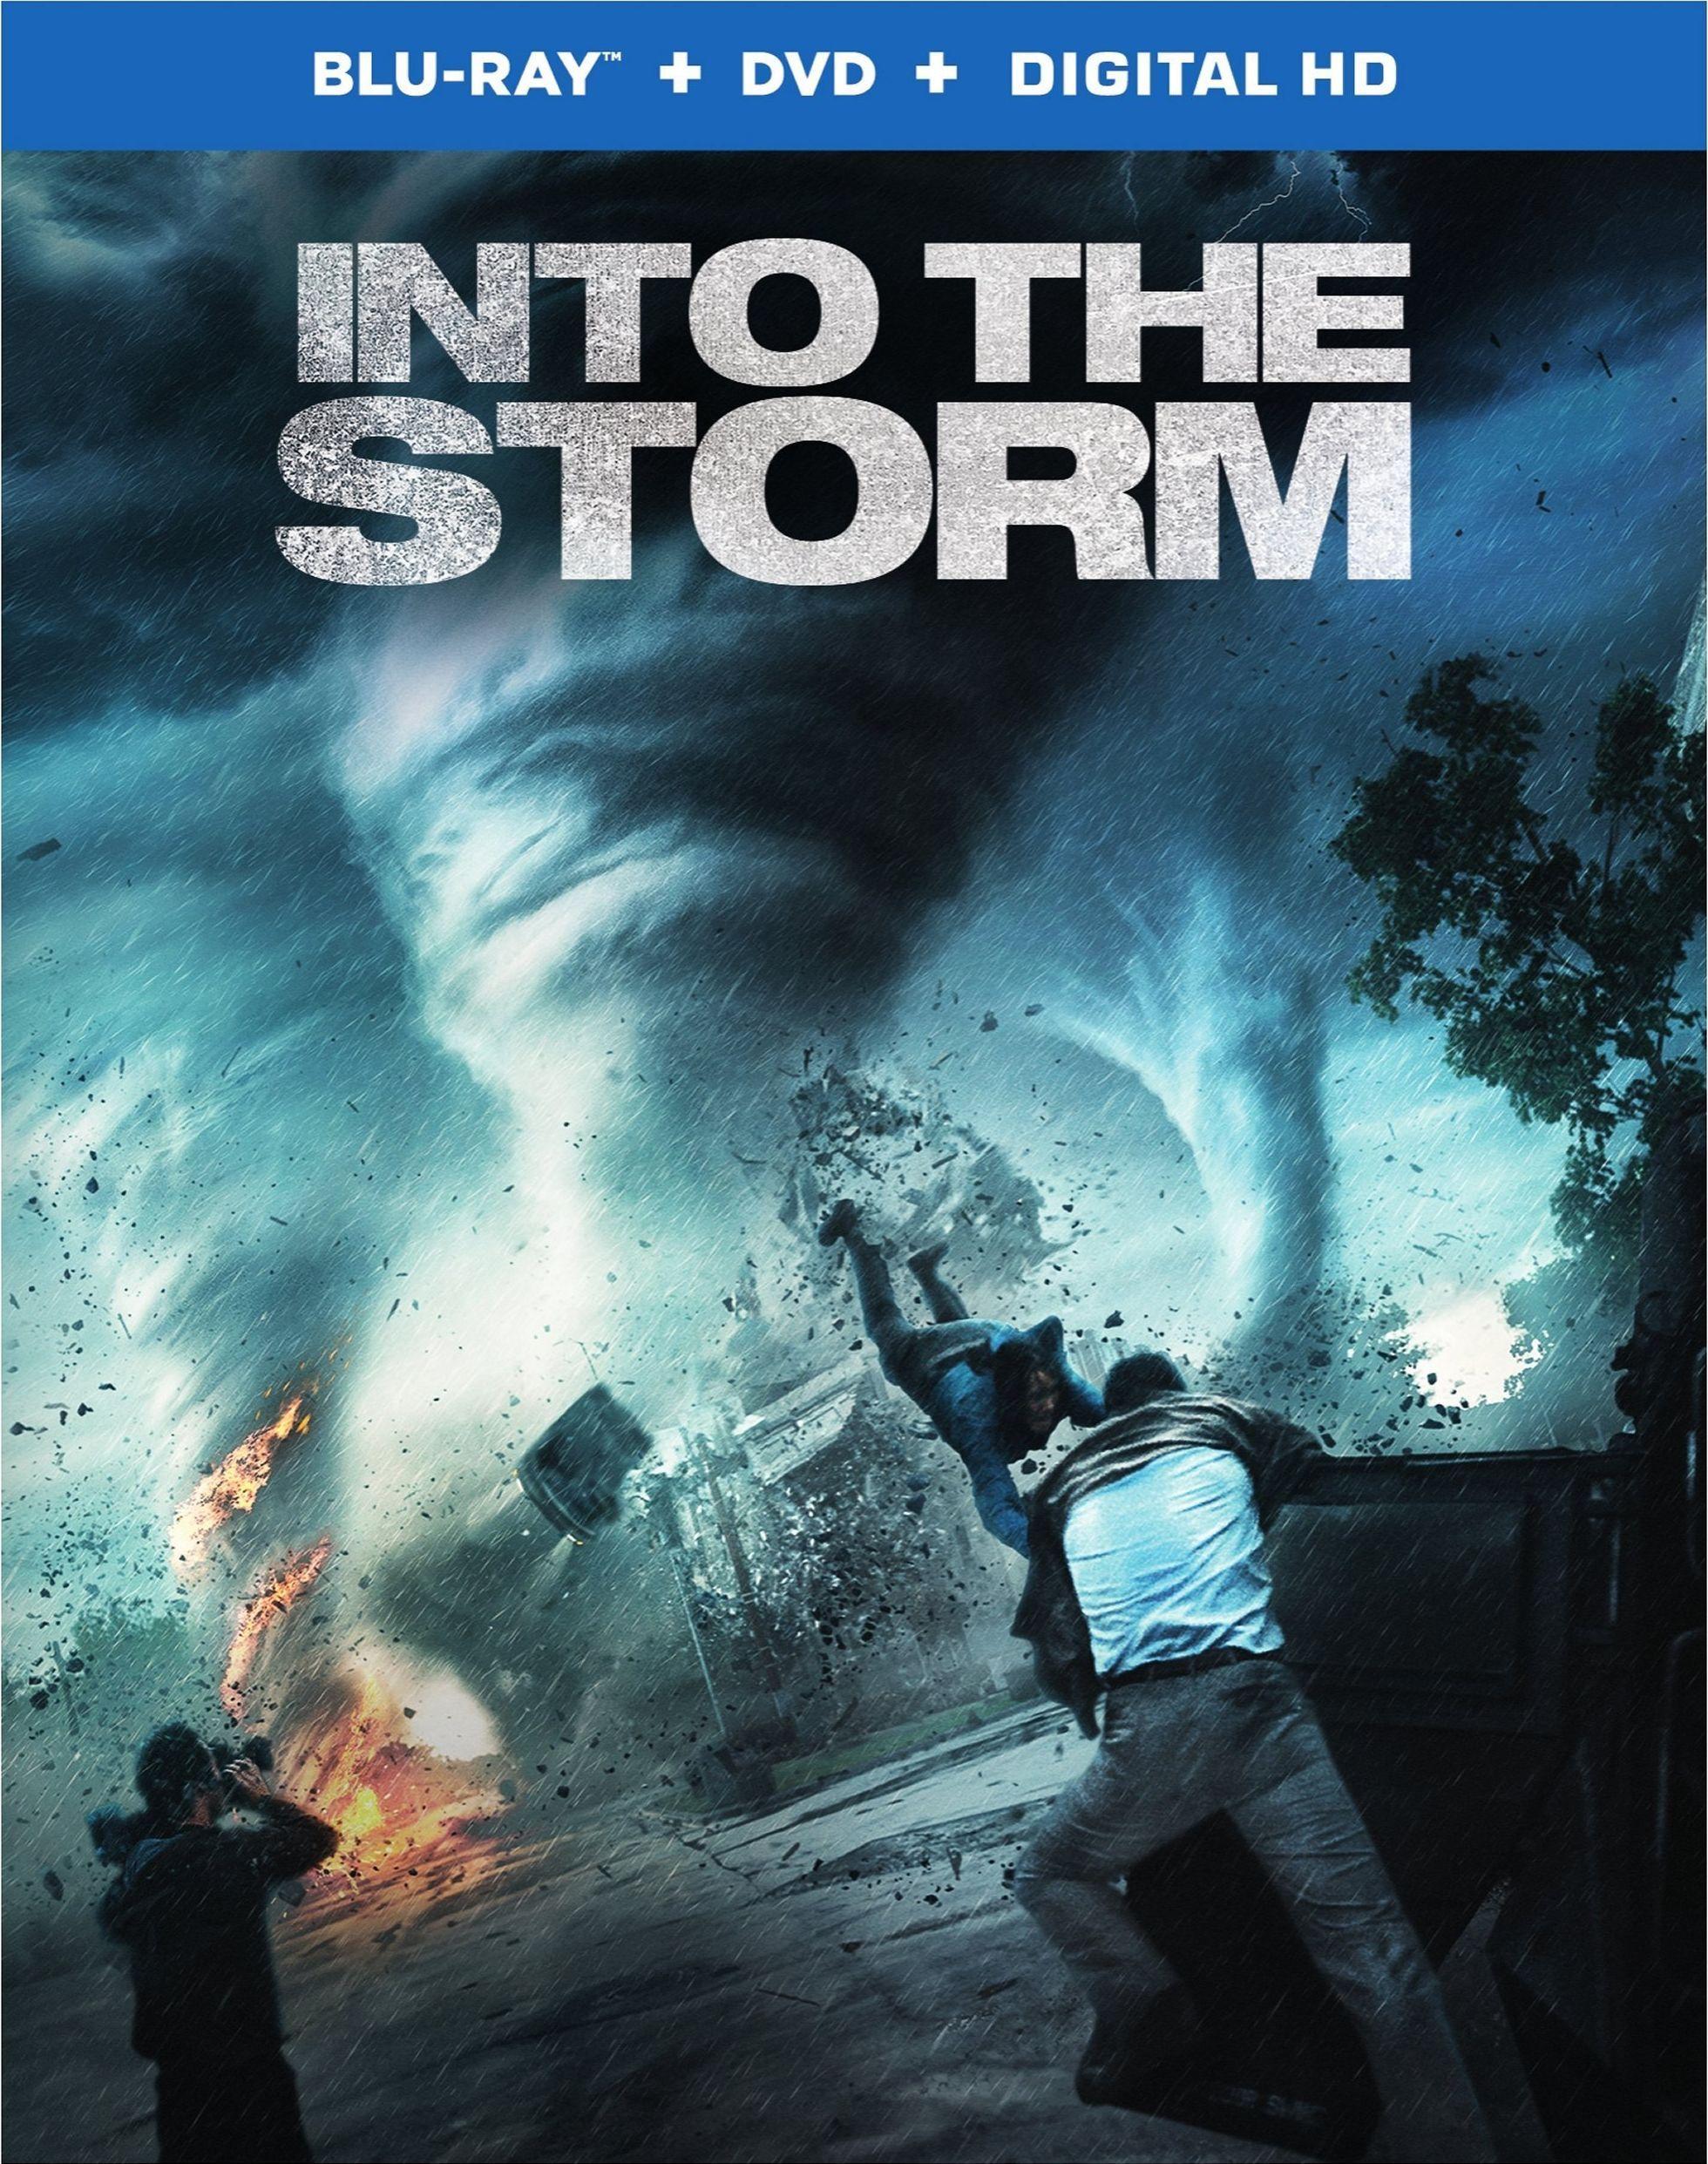 Into the Storm (Bluray + DVD + Digital HD UltraViolet